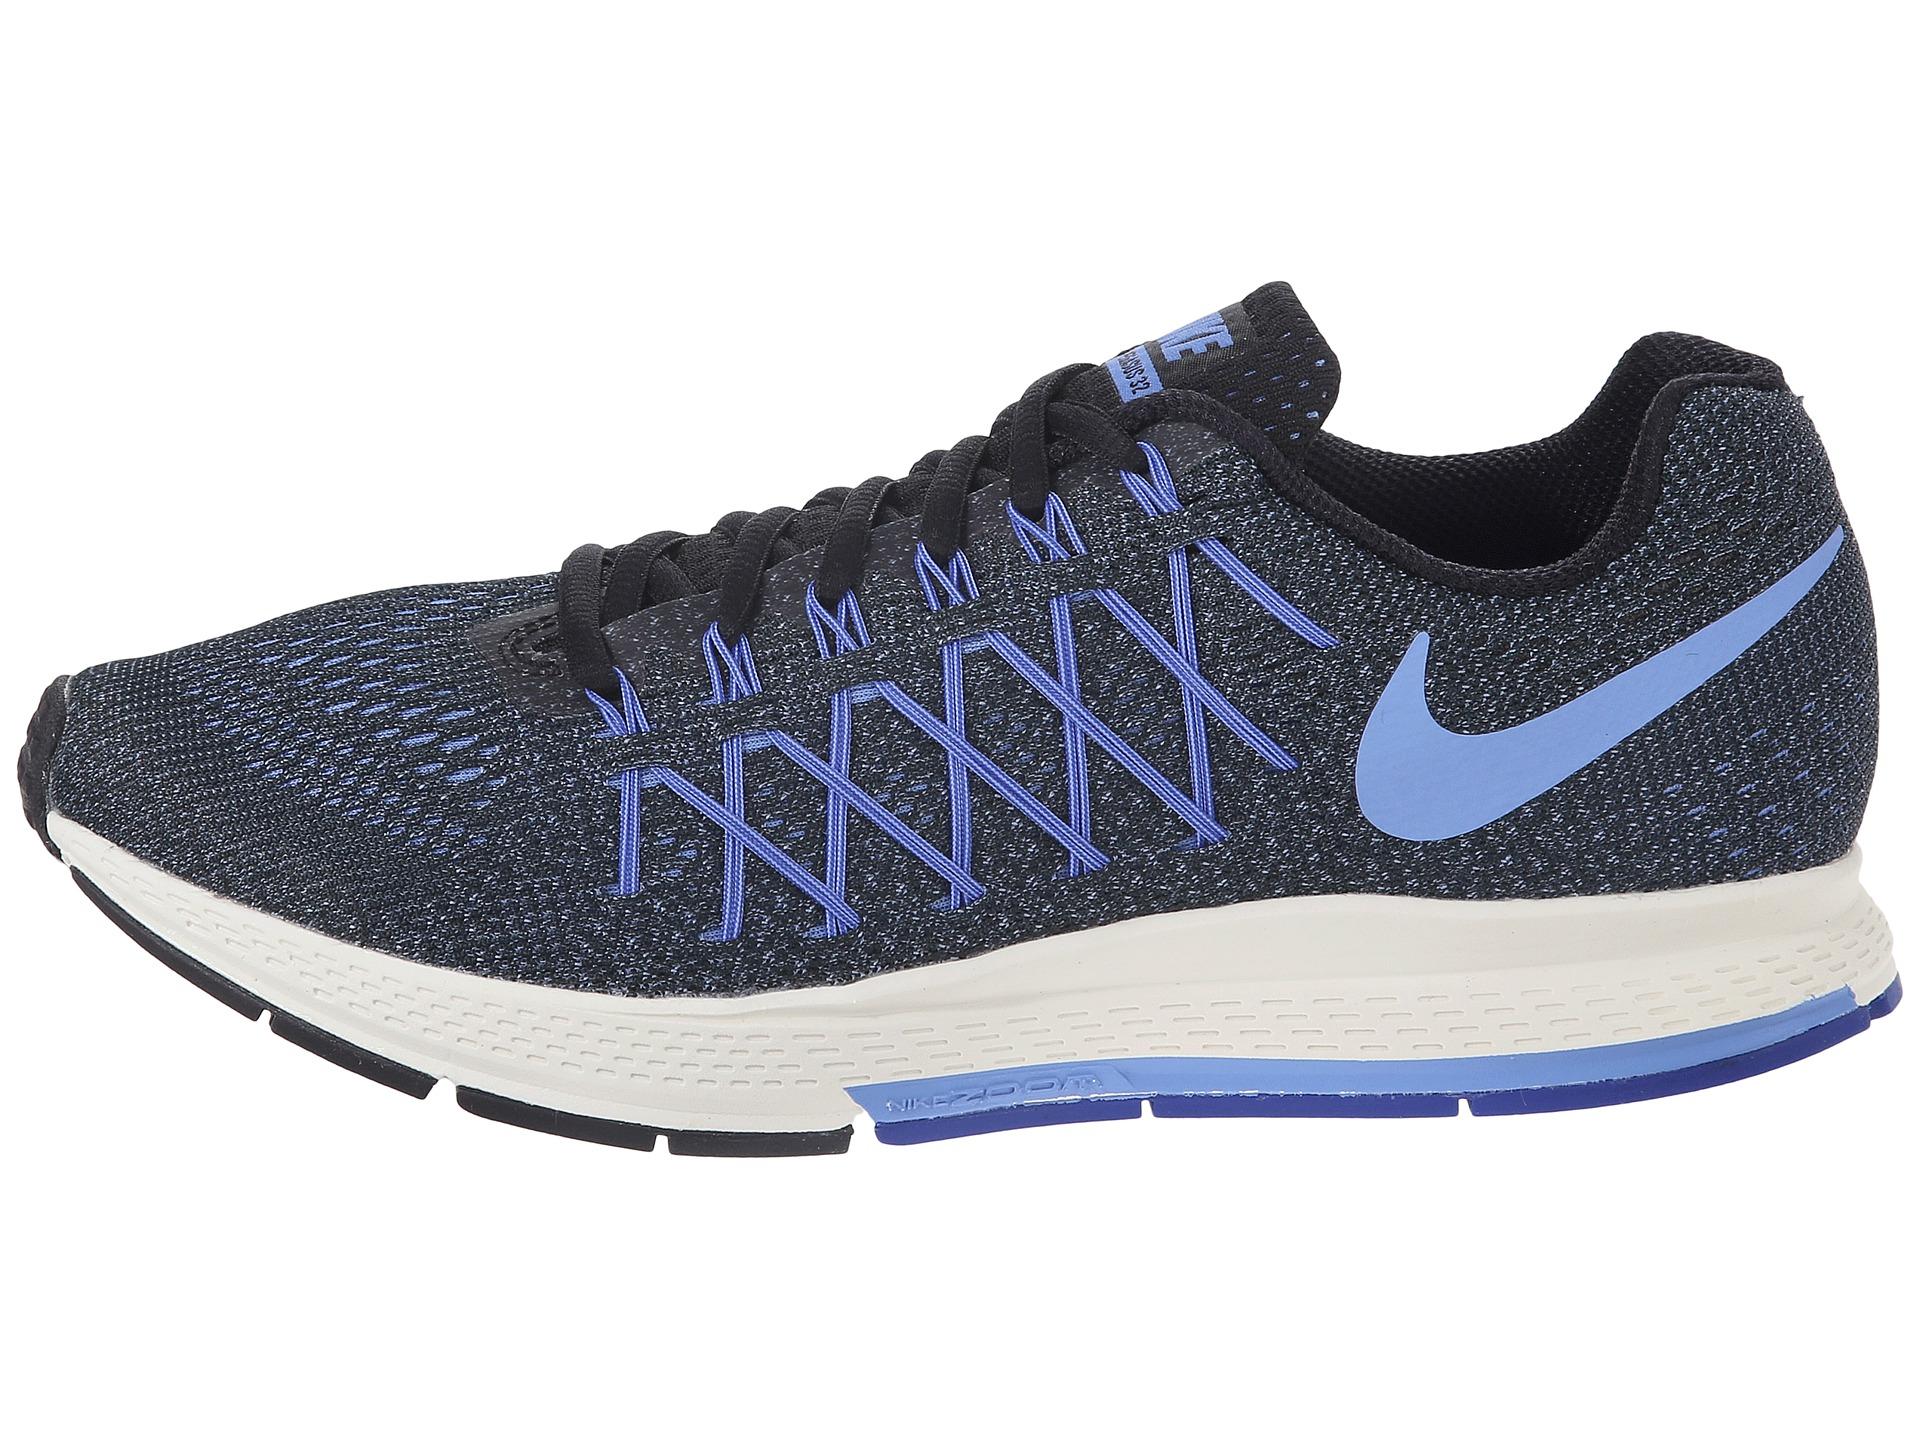 e67ffb8e9f818 Lyst - Nike Air Zoom Pegasus 32 Women´s Running Shoes in Black